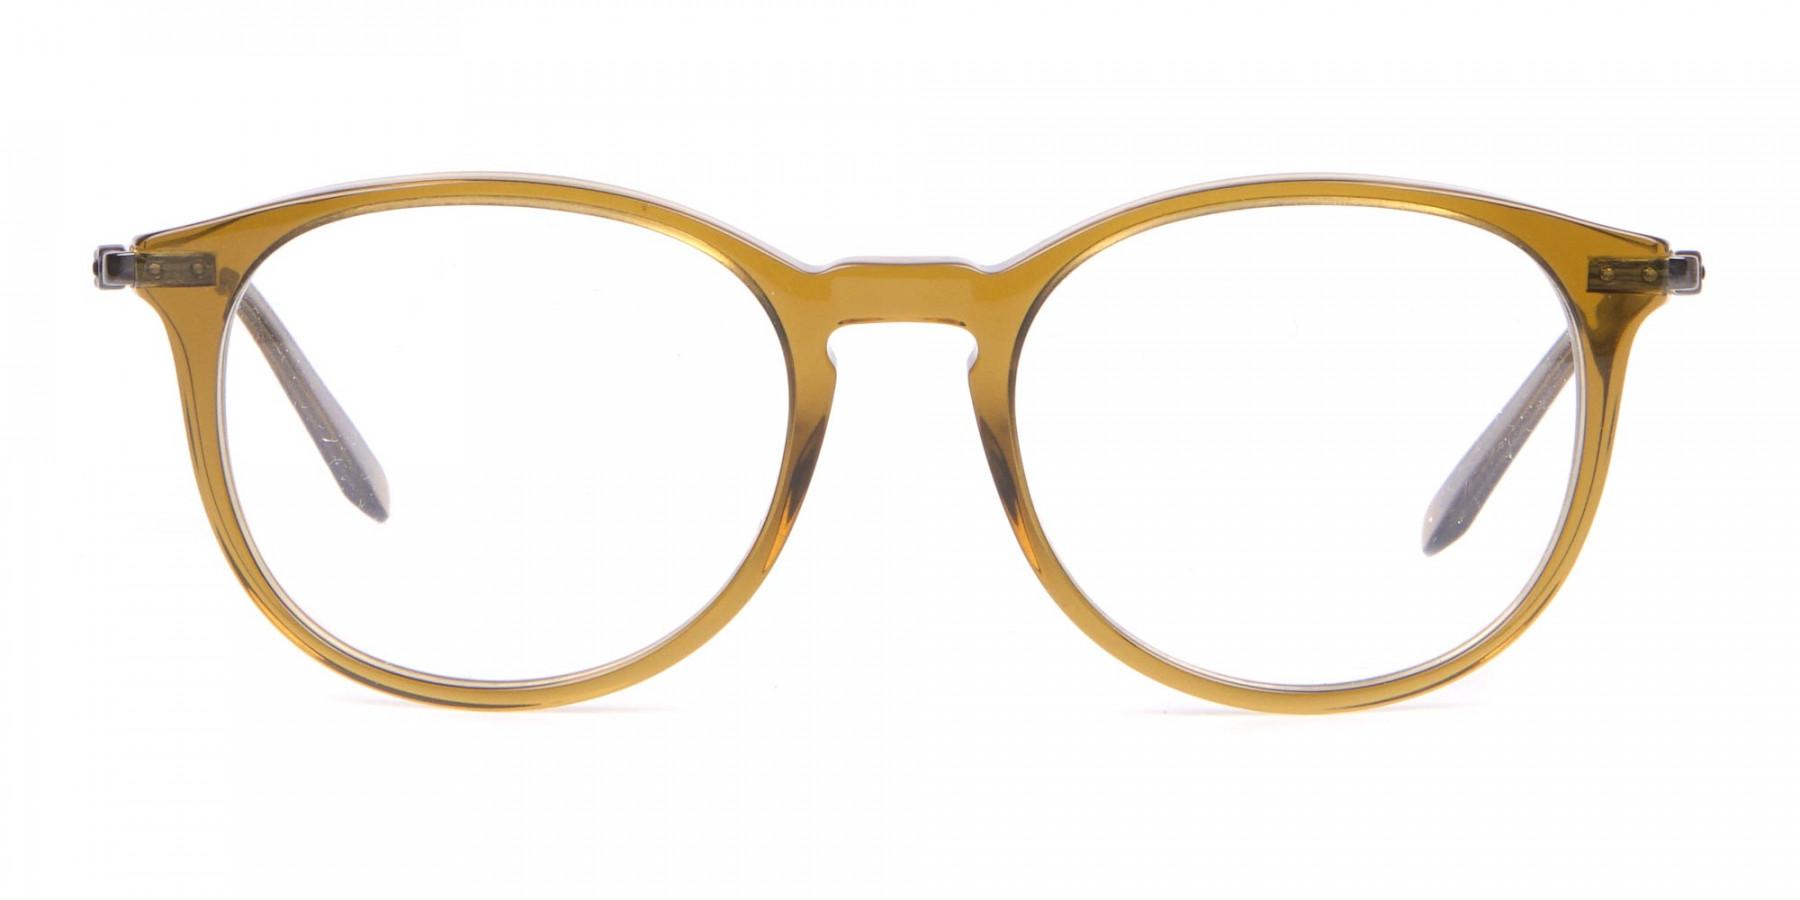 Salvatore Ferragamo SF2123 Retro Round Glasses Khaki-1